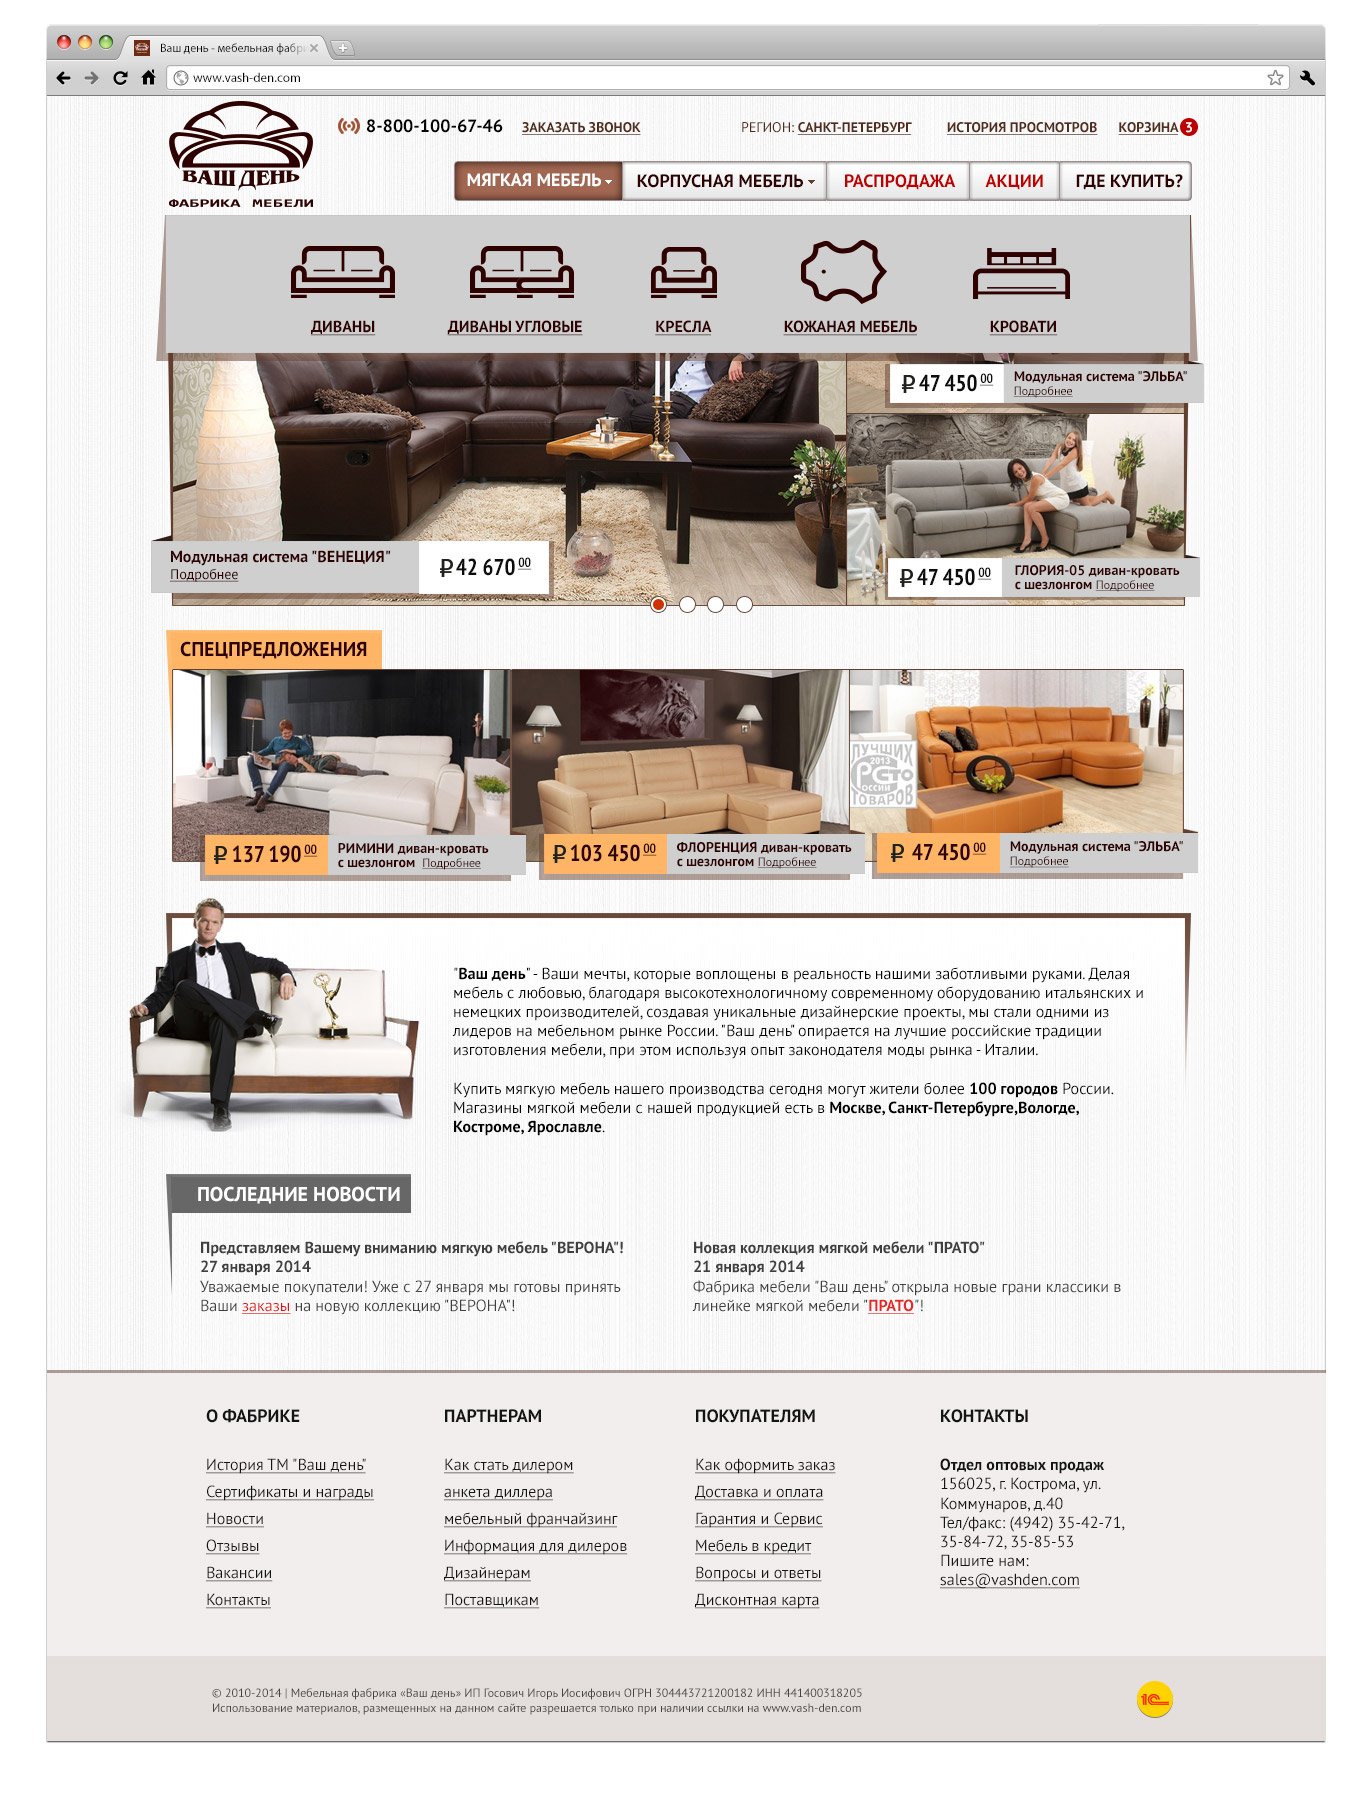 Разработать дизайн для интернет-магазина мебели фото f_79052f363780274a.jpg